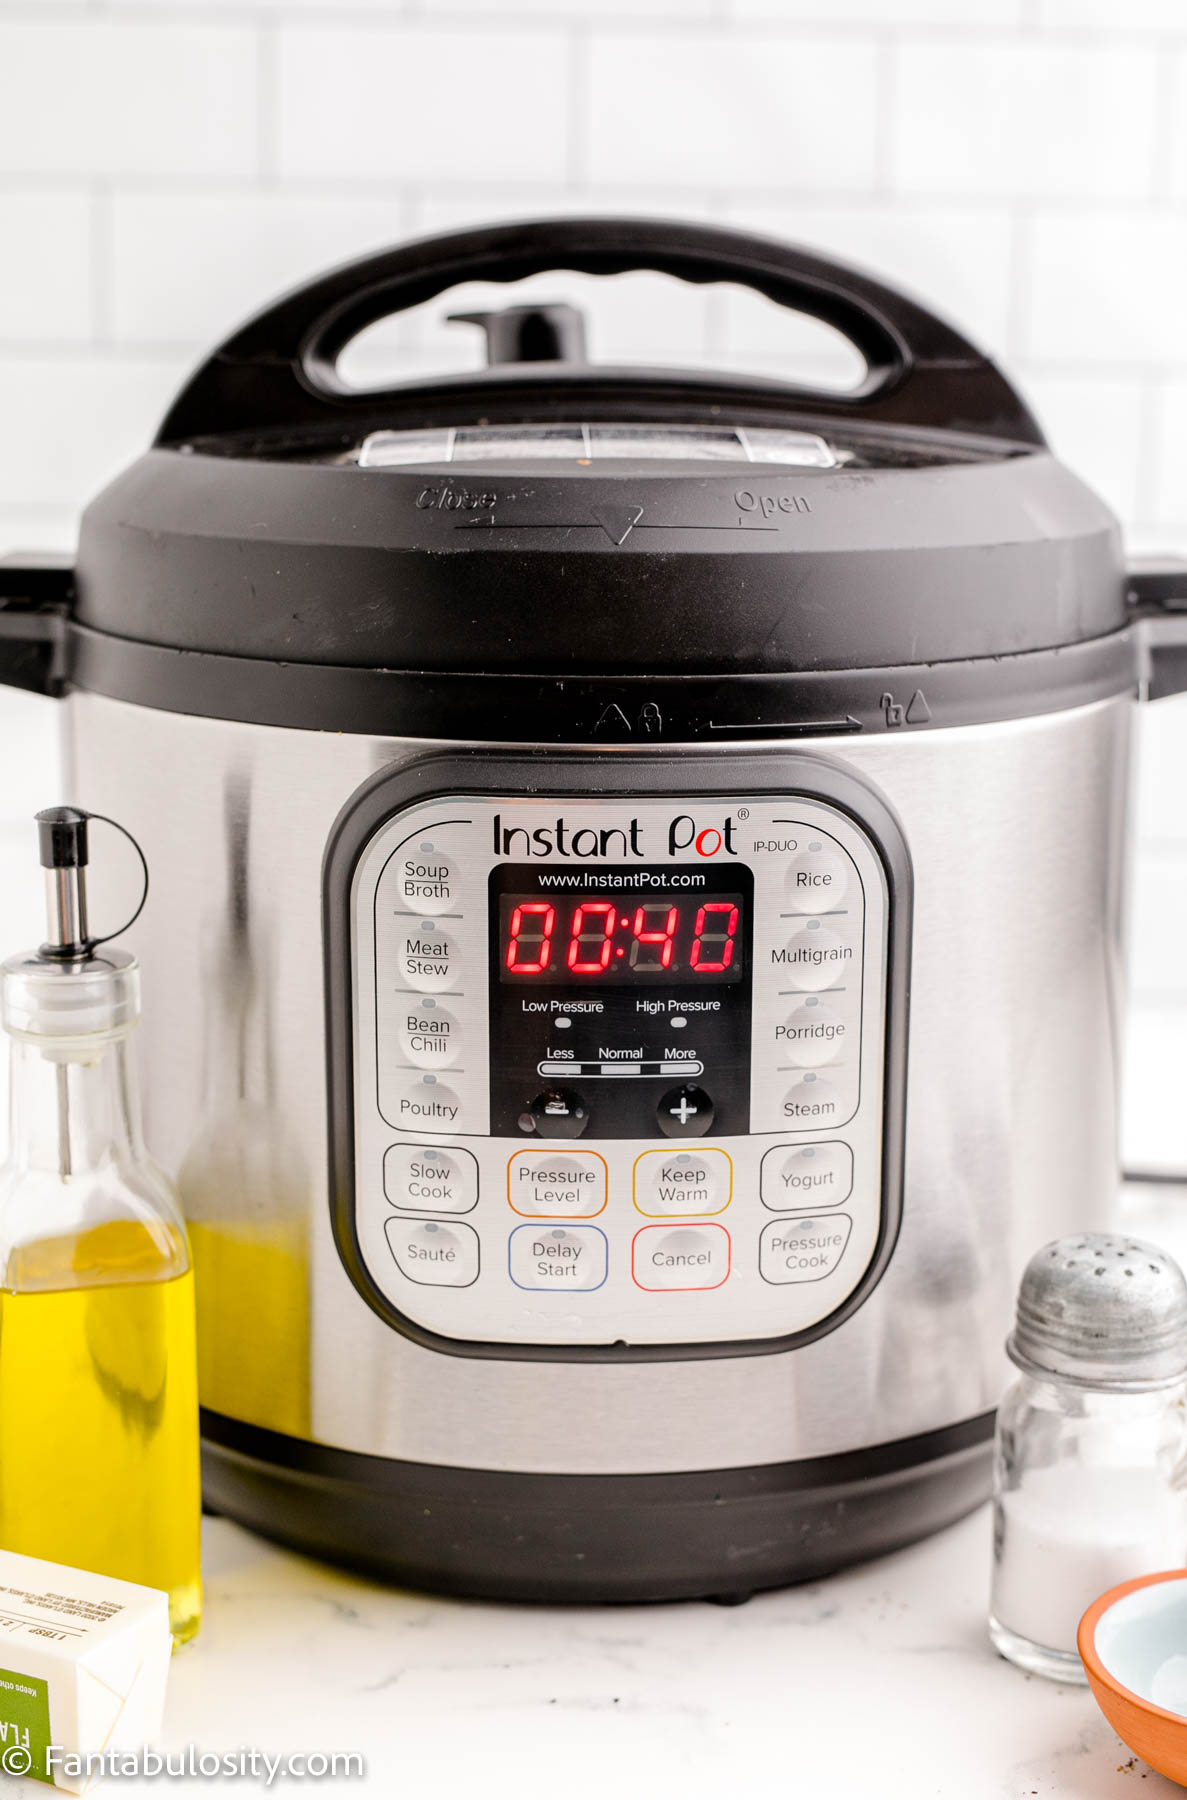 Set timer on Instant Pot to 40 minutes